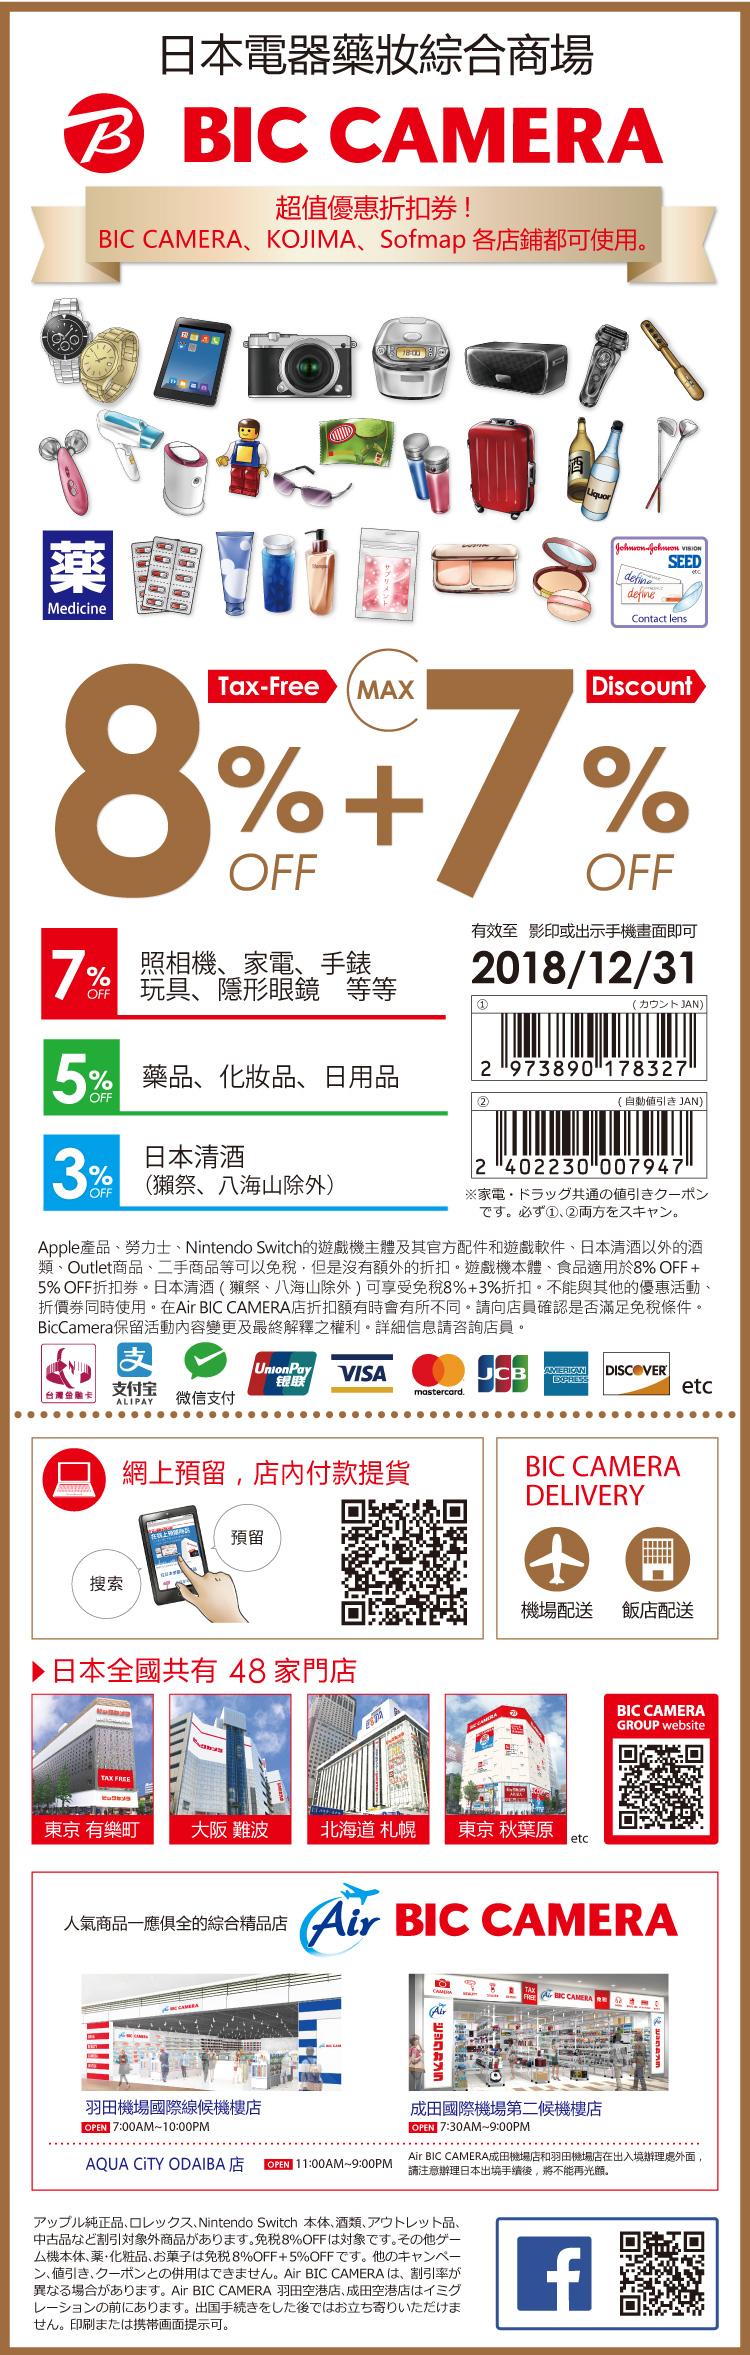 BIC CAMERA優惠券2018年免稅8%加最多7%折扣樂吃購!日本讀者專屬